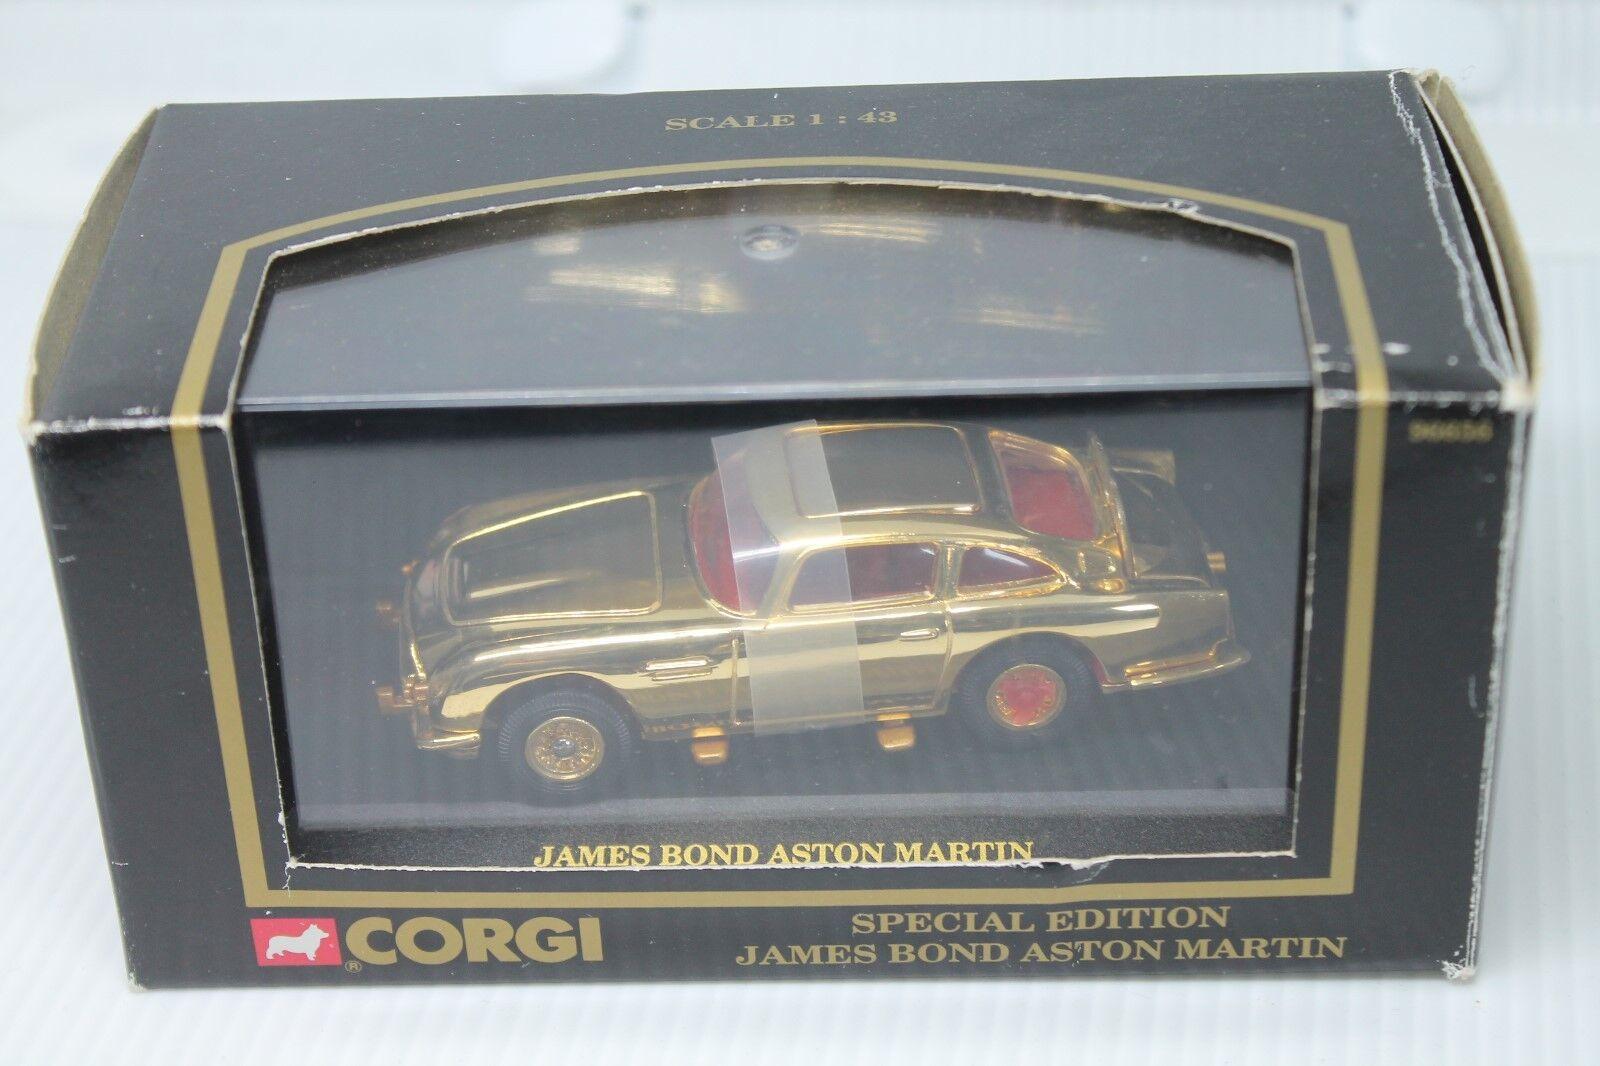 CORGI TOYS  Aston Martin db5  JAMES BOND BOND BOND  Goldfinger  reifenschlitzer | En Ligne  8a2542